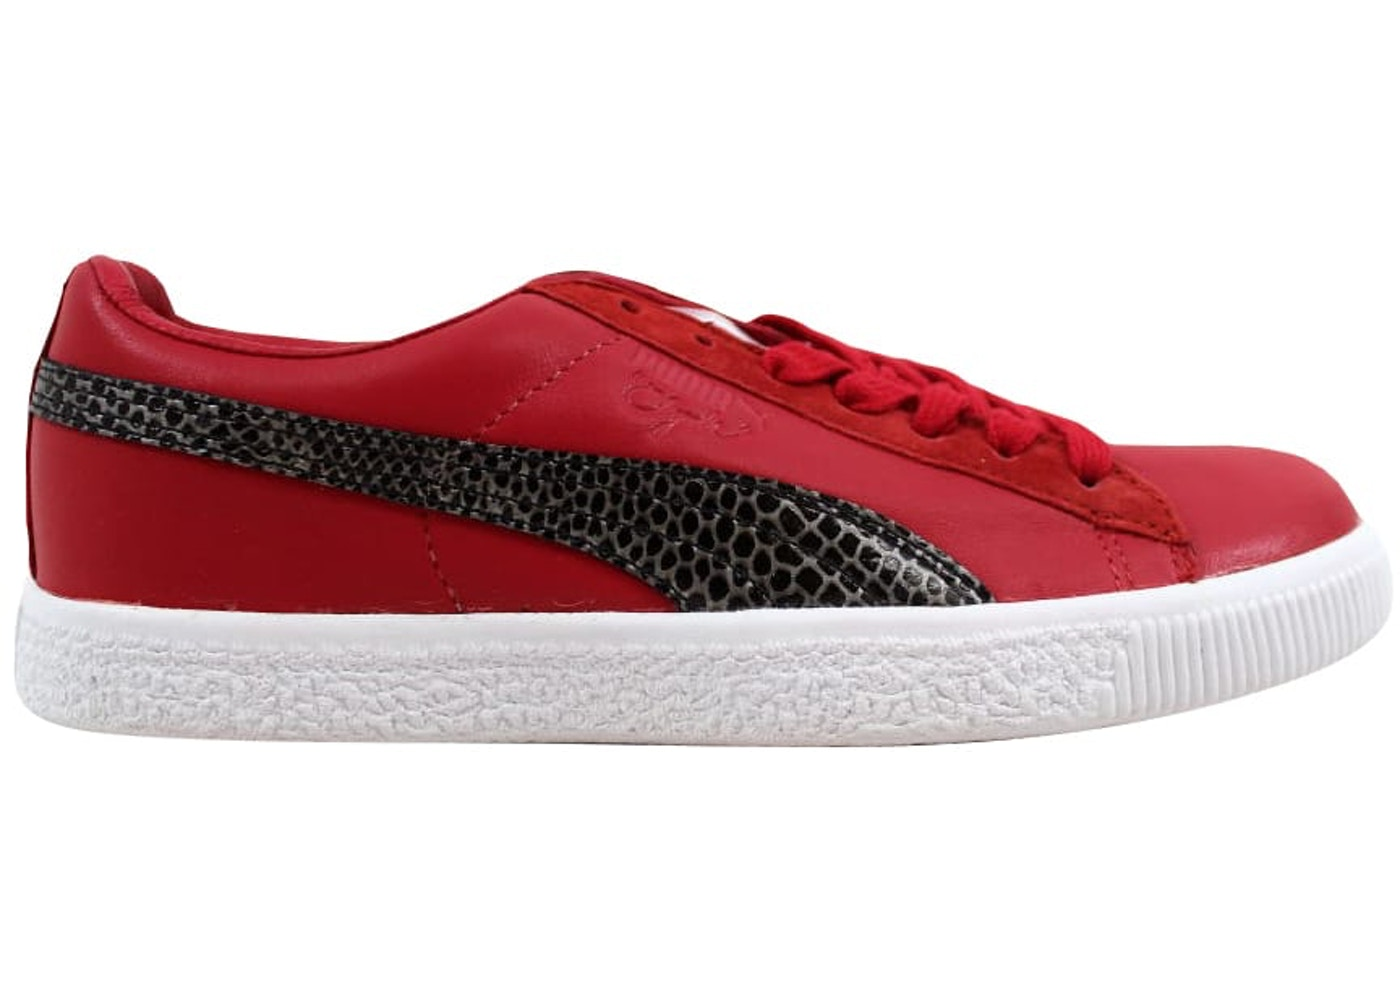 huge discount 1b0c1 76afa Puma Clyde X Undftd Snakeskin Ribbon Red - 353917-02